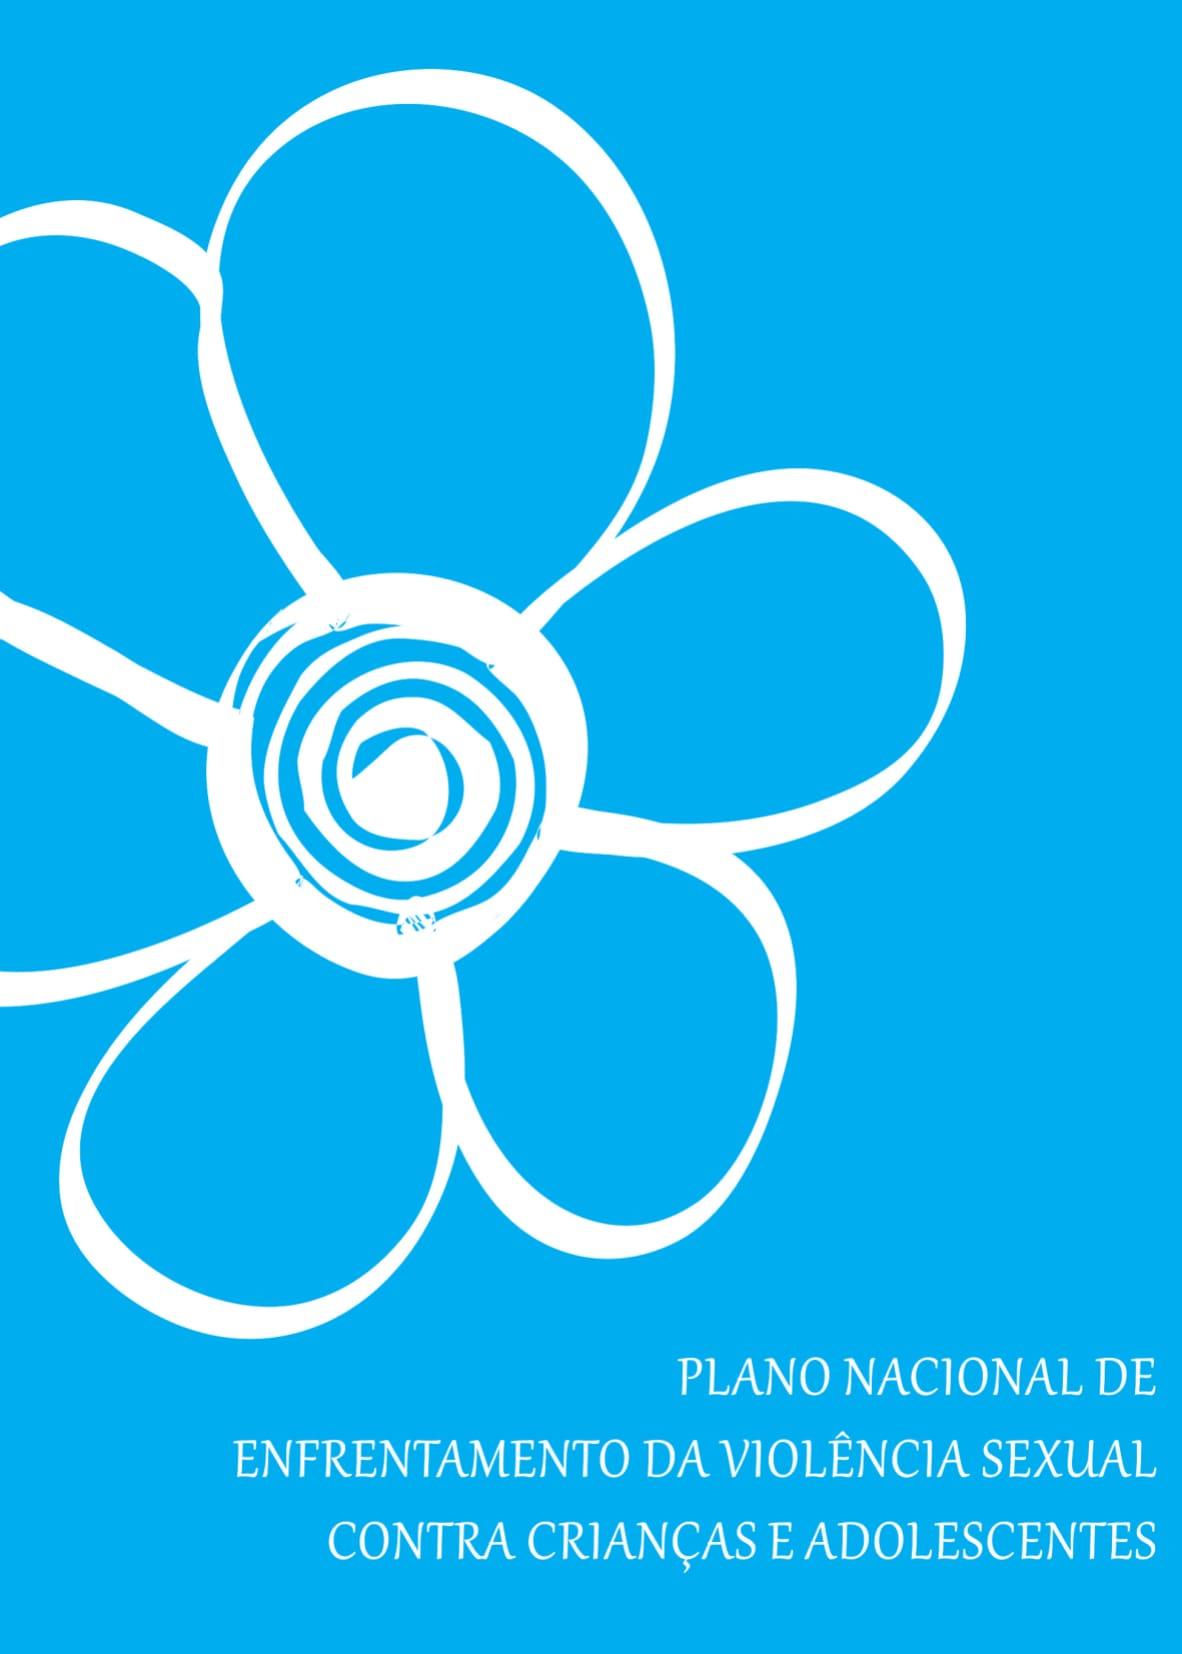 LIVRO PLANO NACIONAL _12_02_2015-1-1-1.jpg